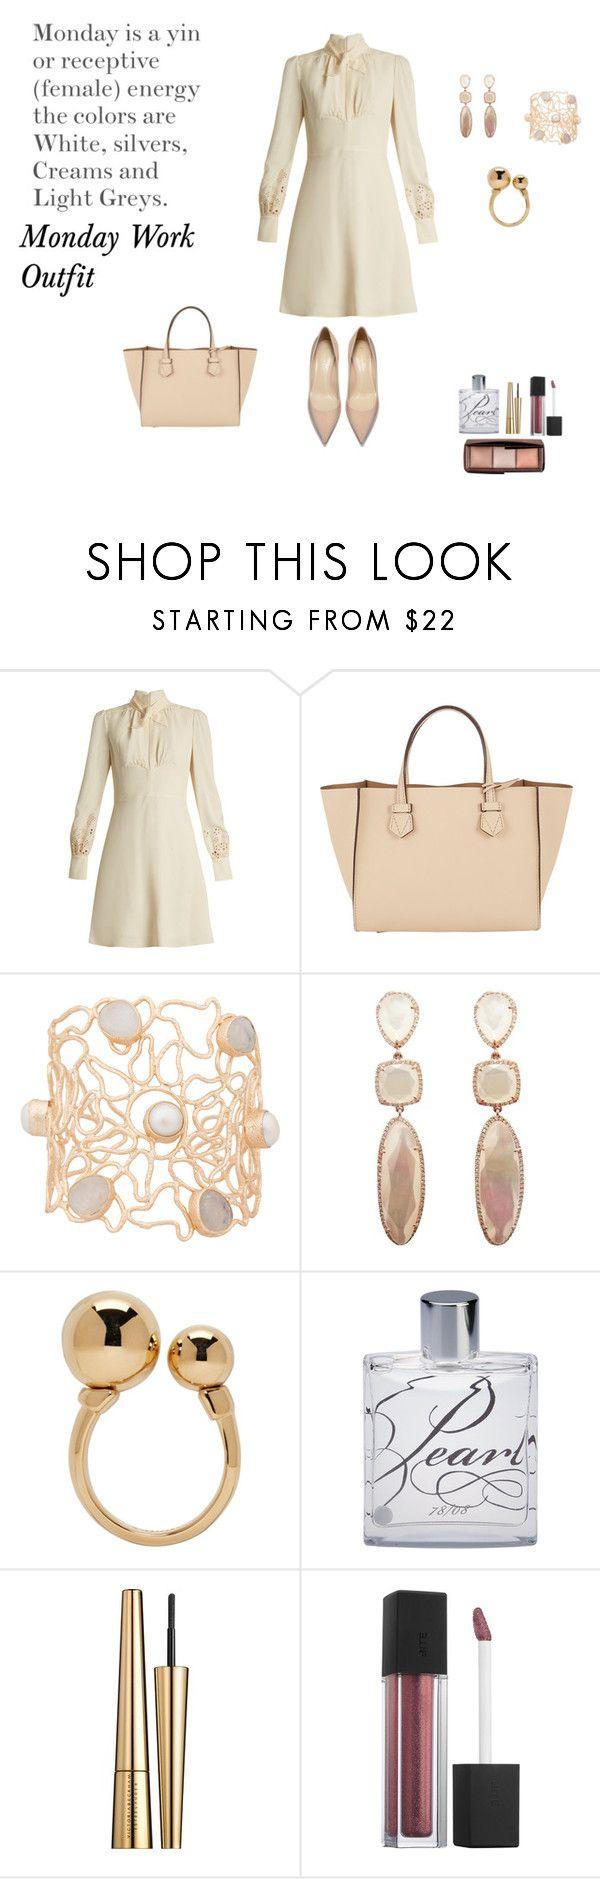 """Monday Work Outfit-White"" by rebeccadavisblogger on Polyvore featuring Chloé, Moreau, Atelier Mon, Apothia, Estée Lauder, Bite and Hourglass Cosmetics"